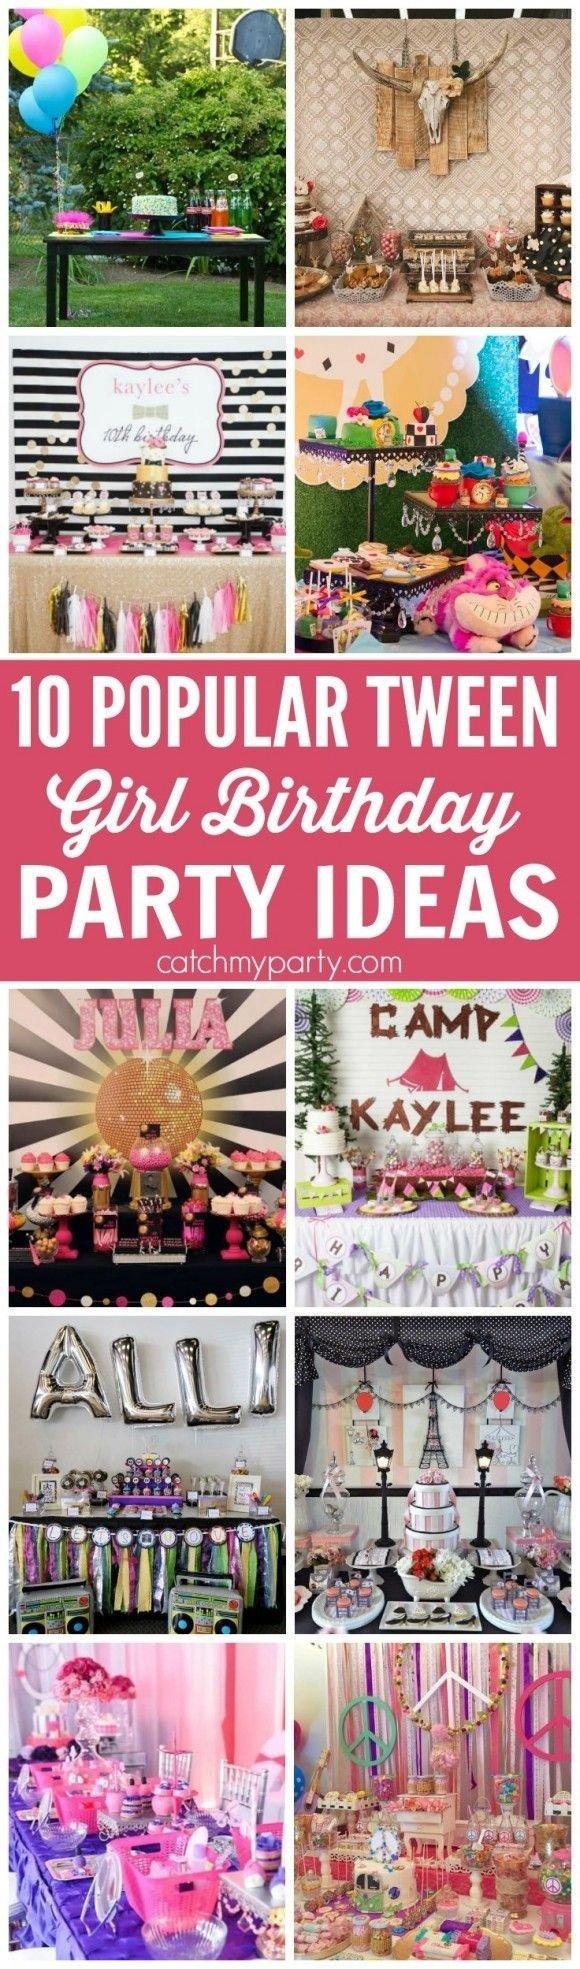 10 best fun birthday ideas for teenagers